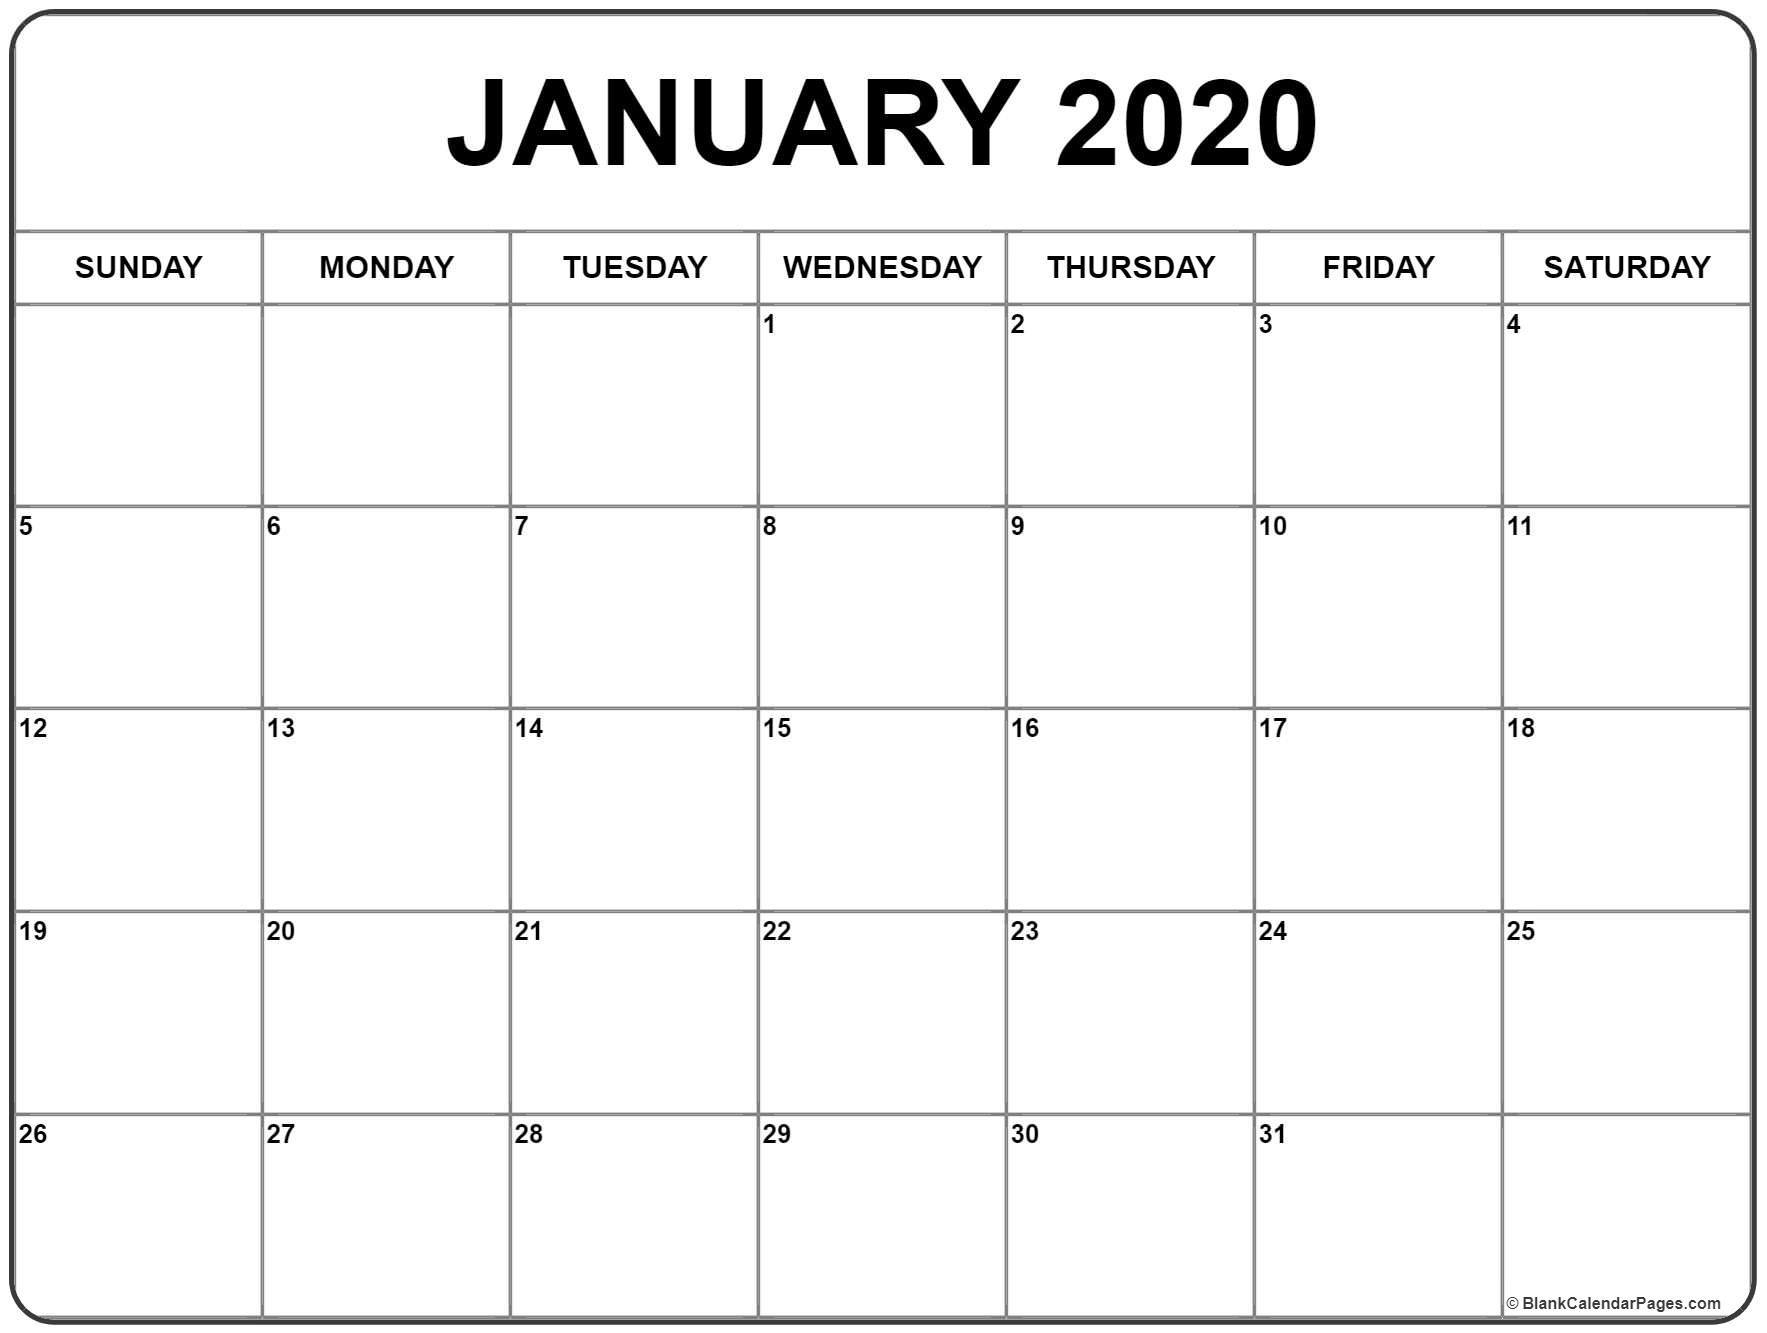 Extraordinary 2020 Calendar For January • Printable Blank Calendar regarding 2020 Printable Calendar By Month